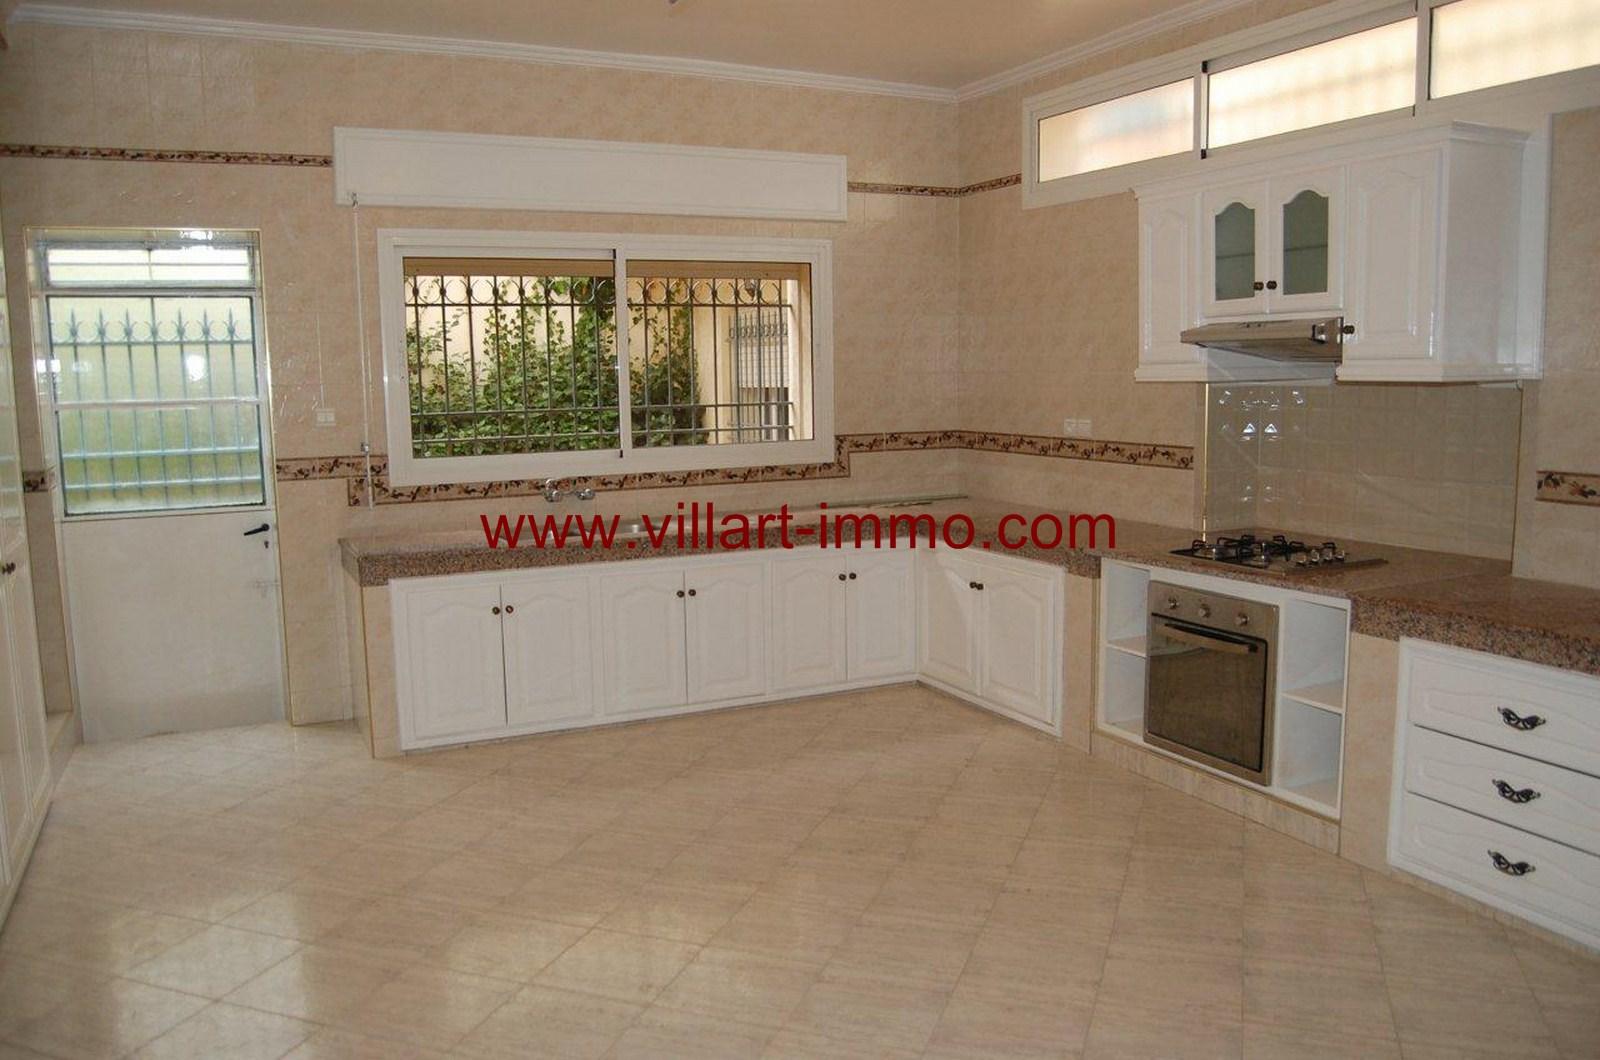 11-location-villa-non-meublee-malabata-tanger-cuisine-lv902-villart-immo